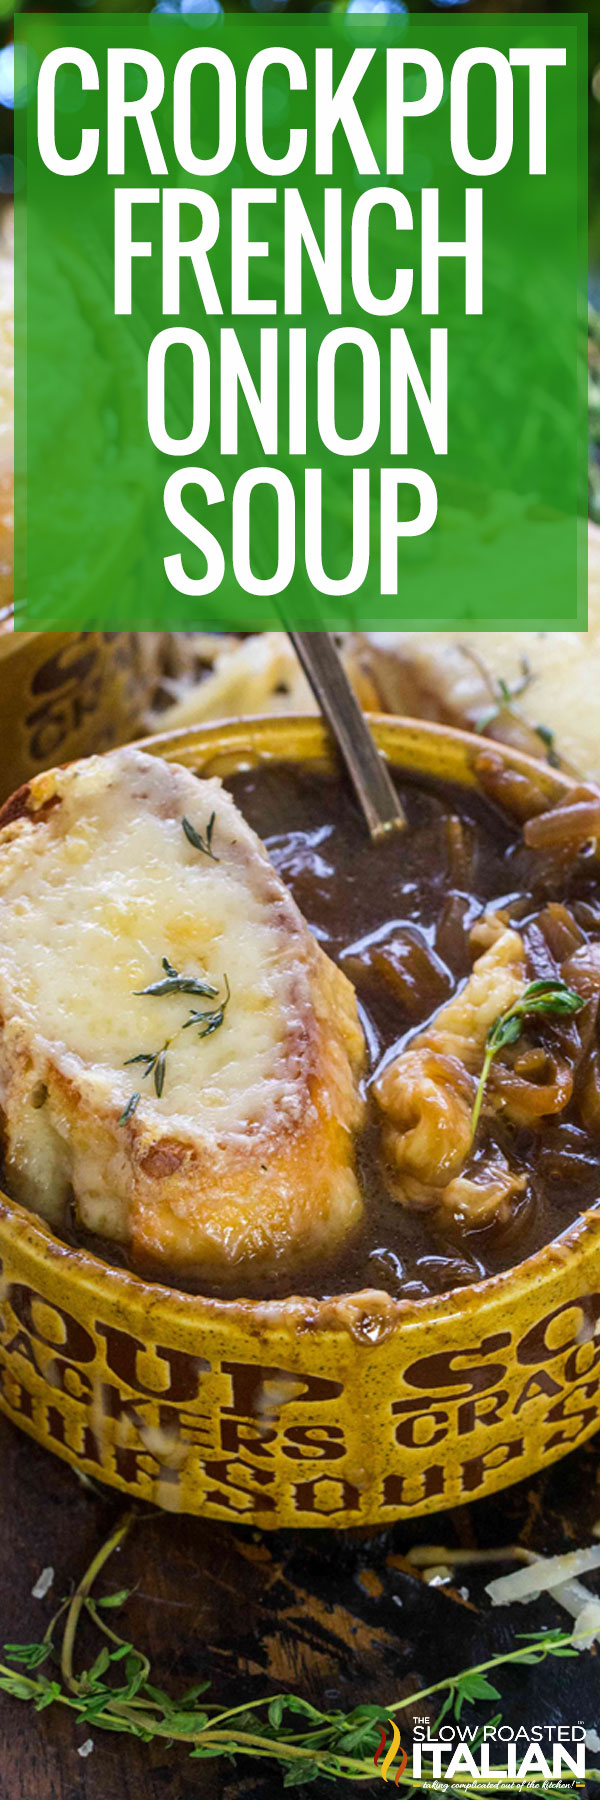 Bowl of Crockpot French Onion Soup